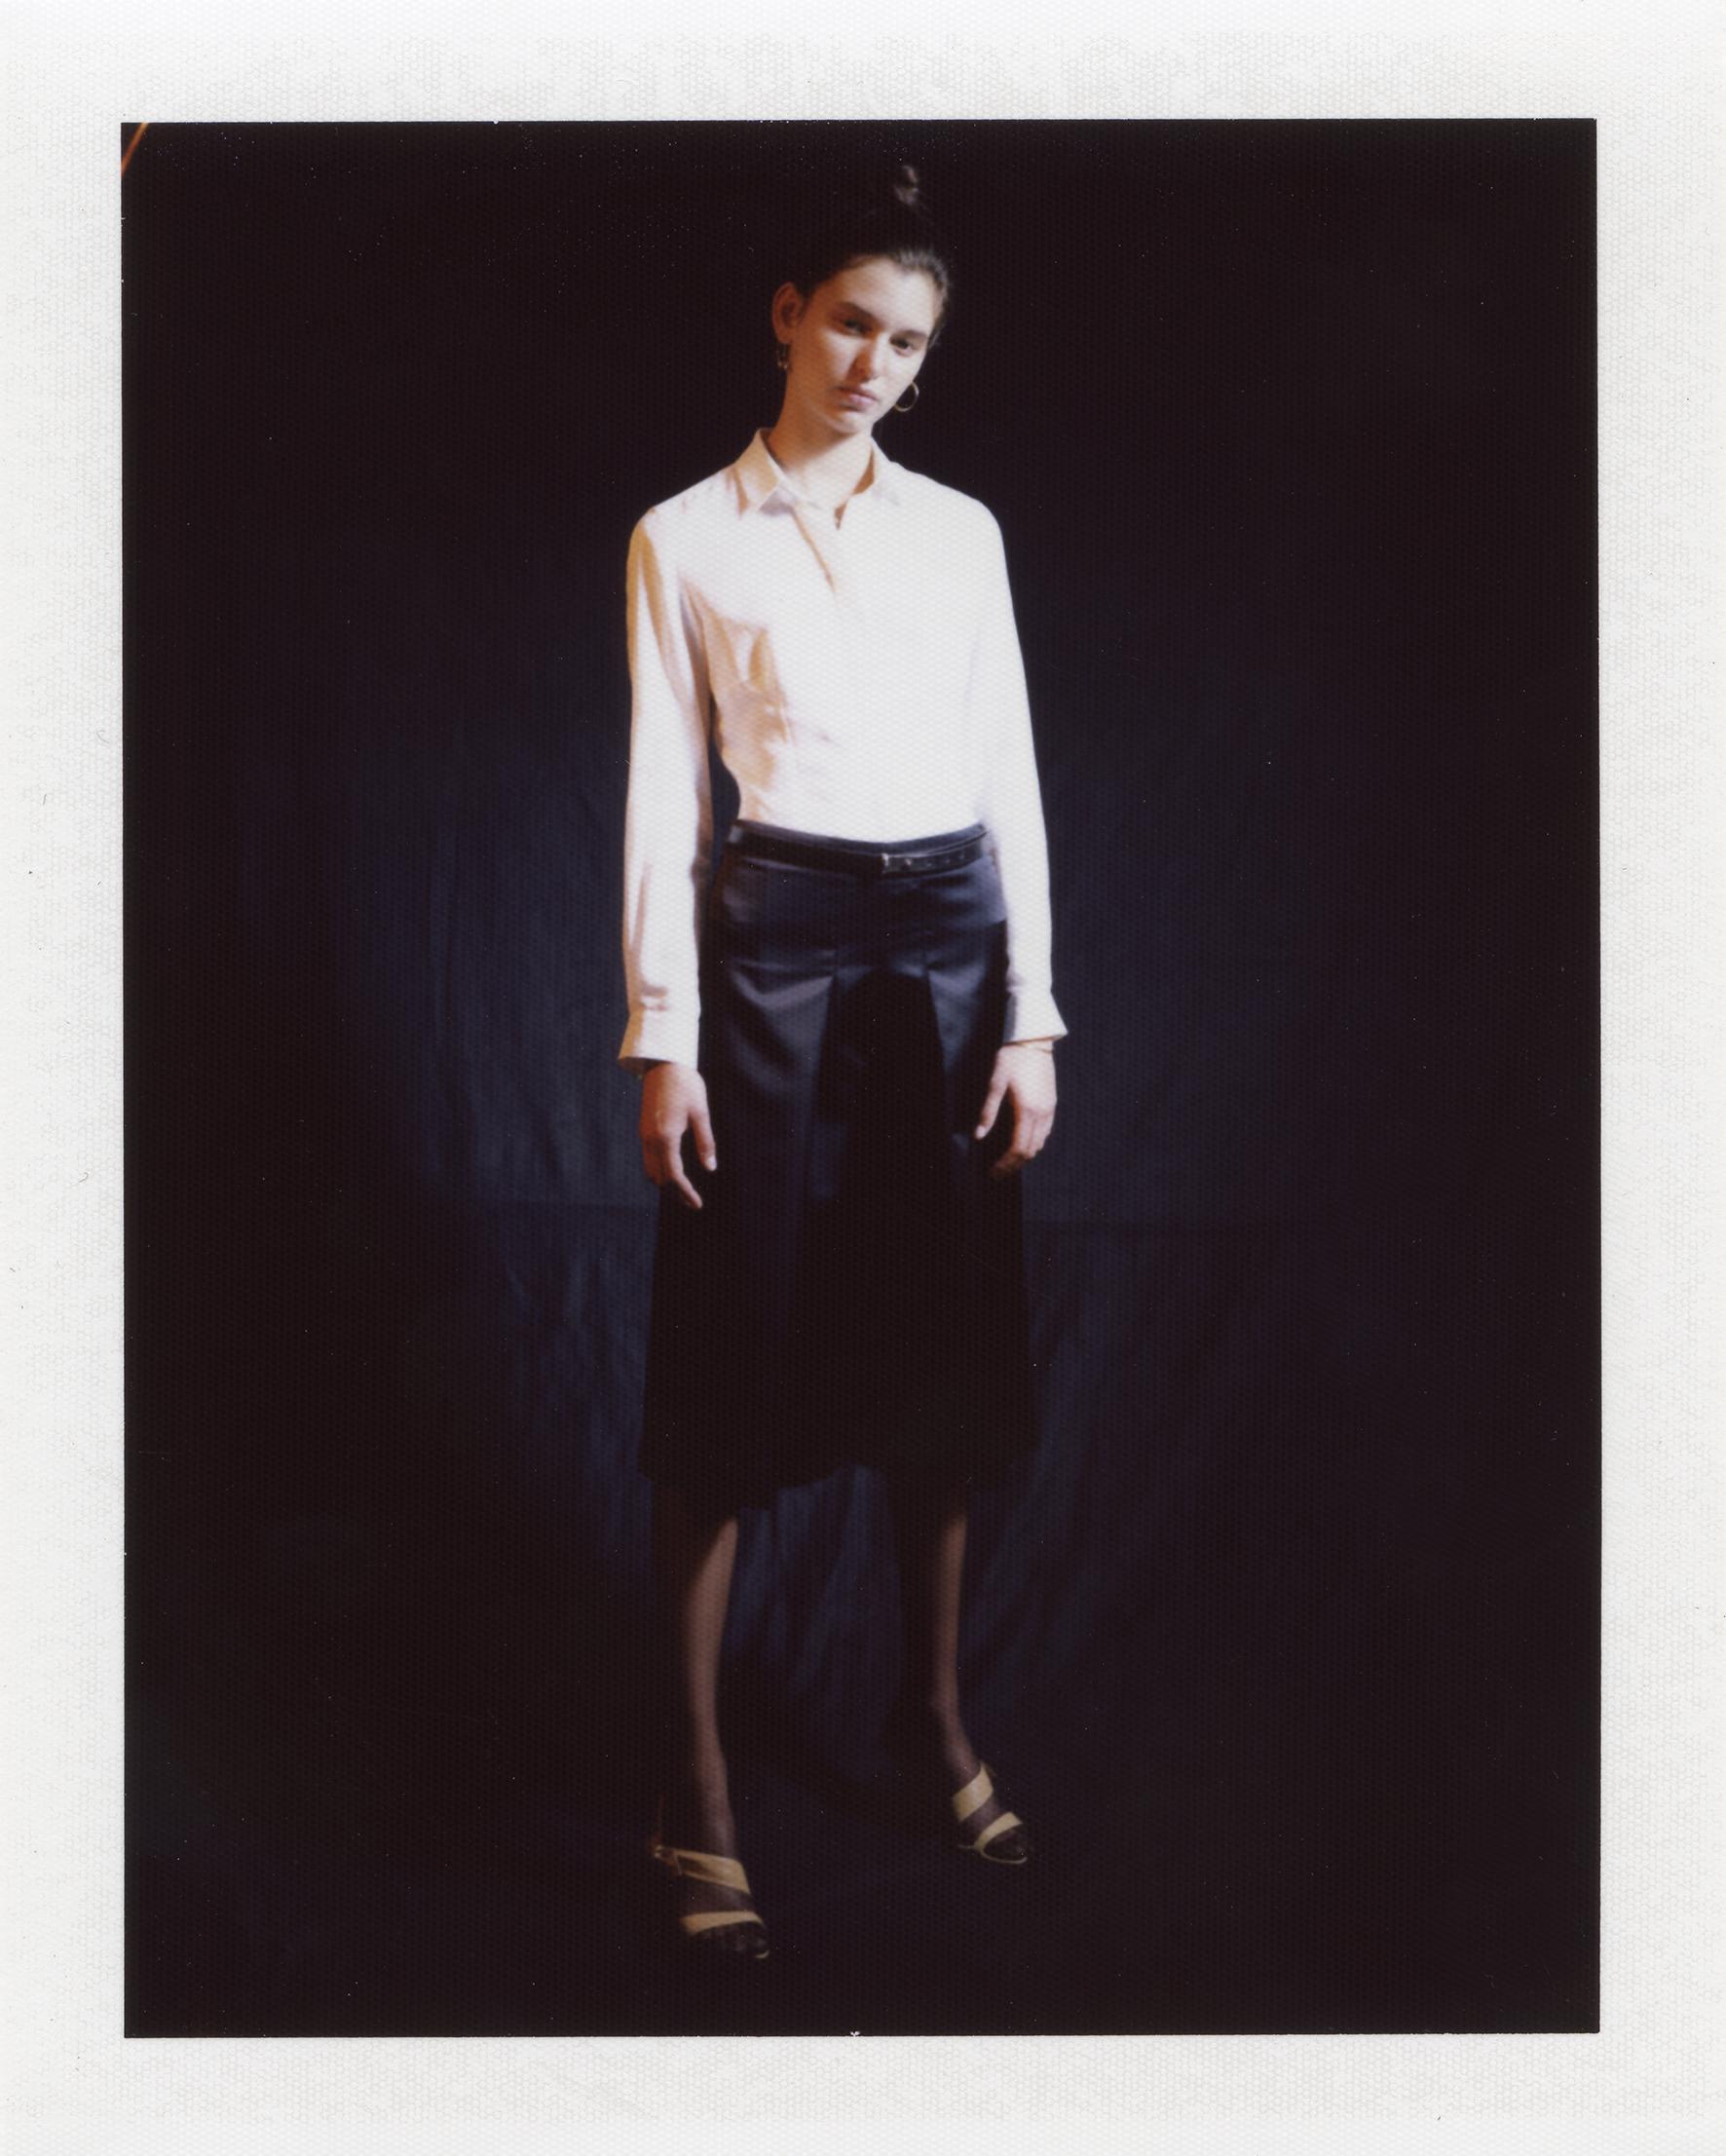 White shirt, black satin skirt. 18ct golden hoop and square earrings ATELIER VM,sandals MIU MIU at MADAME PAULINE VINTAGE, leather belt MAISON MARGIELA